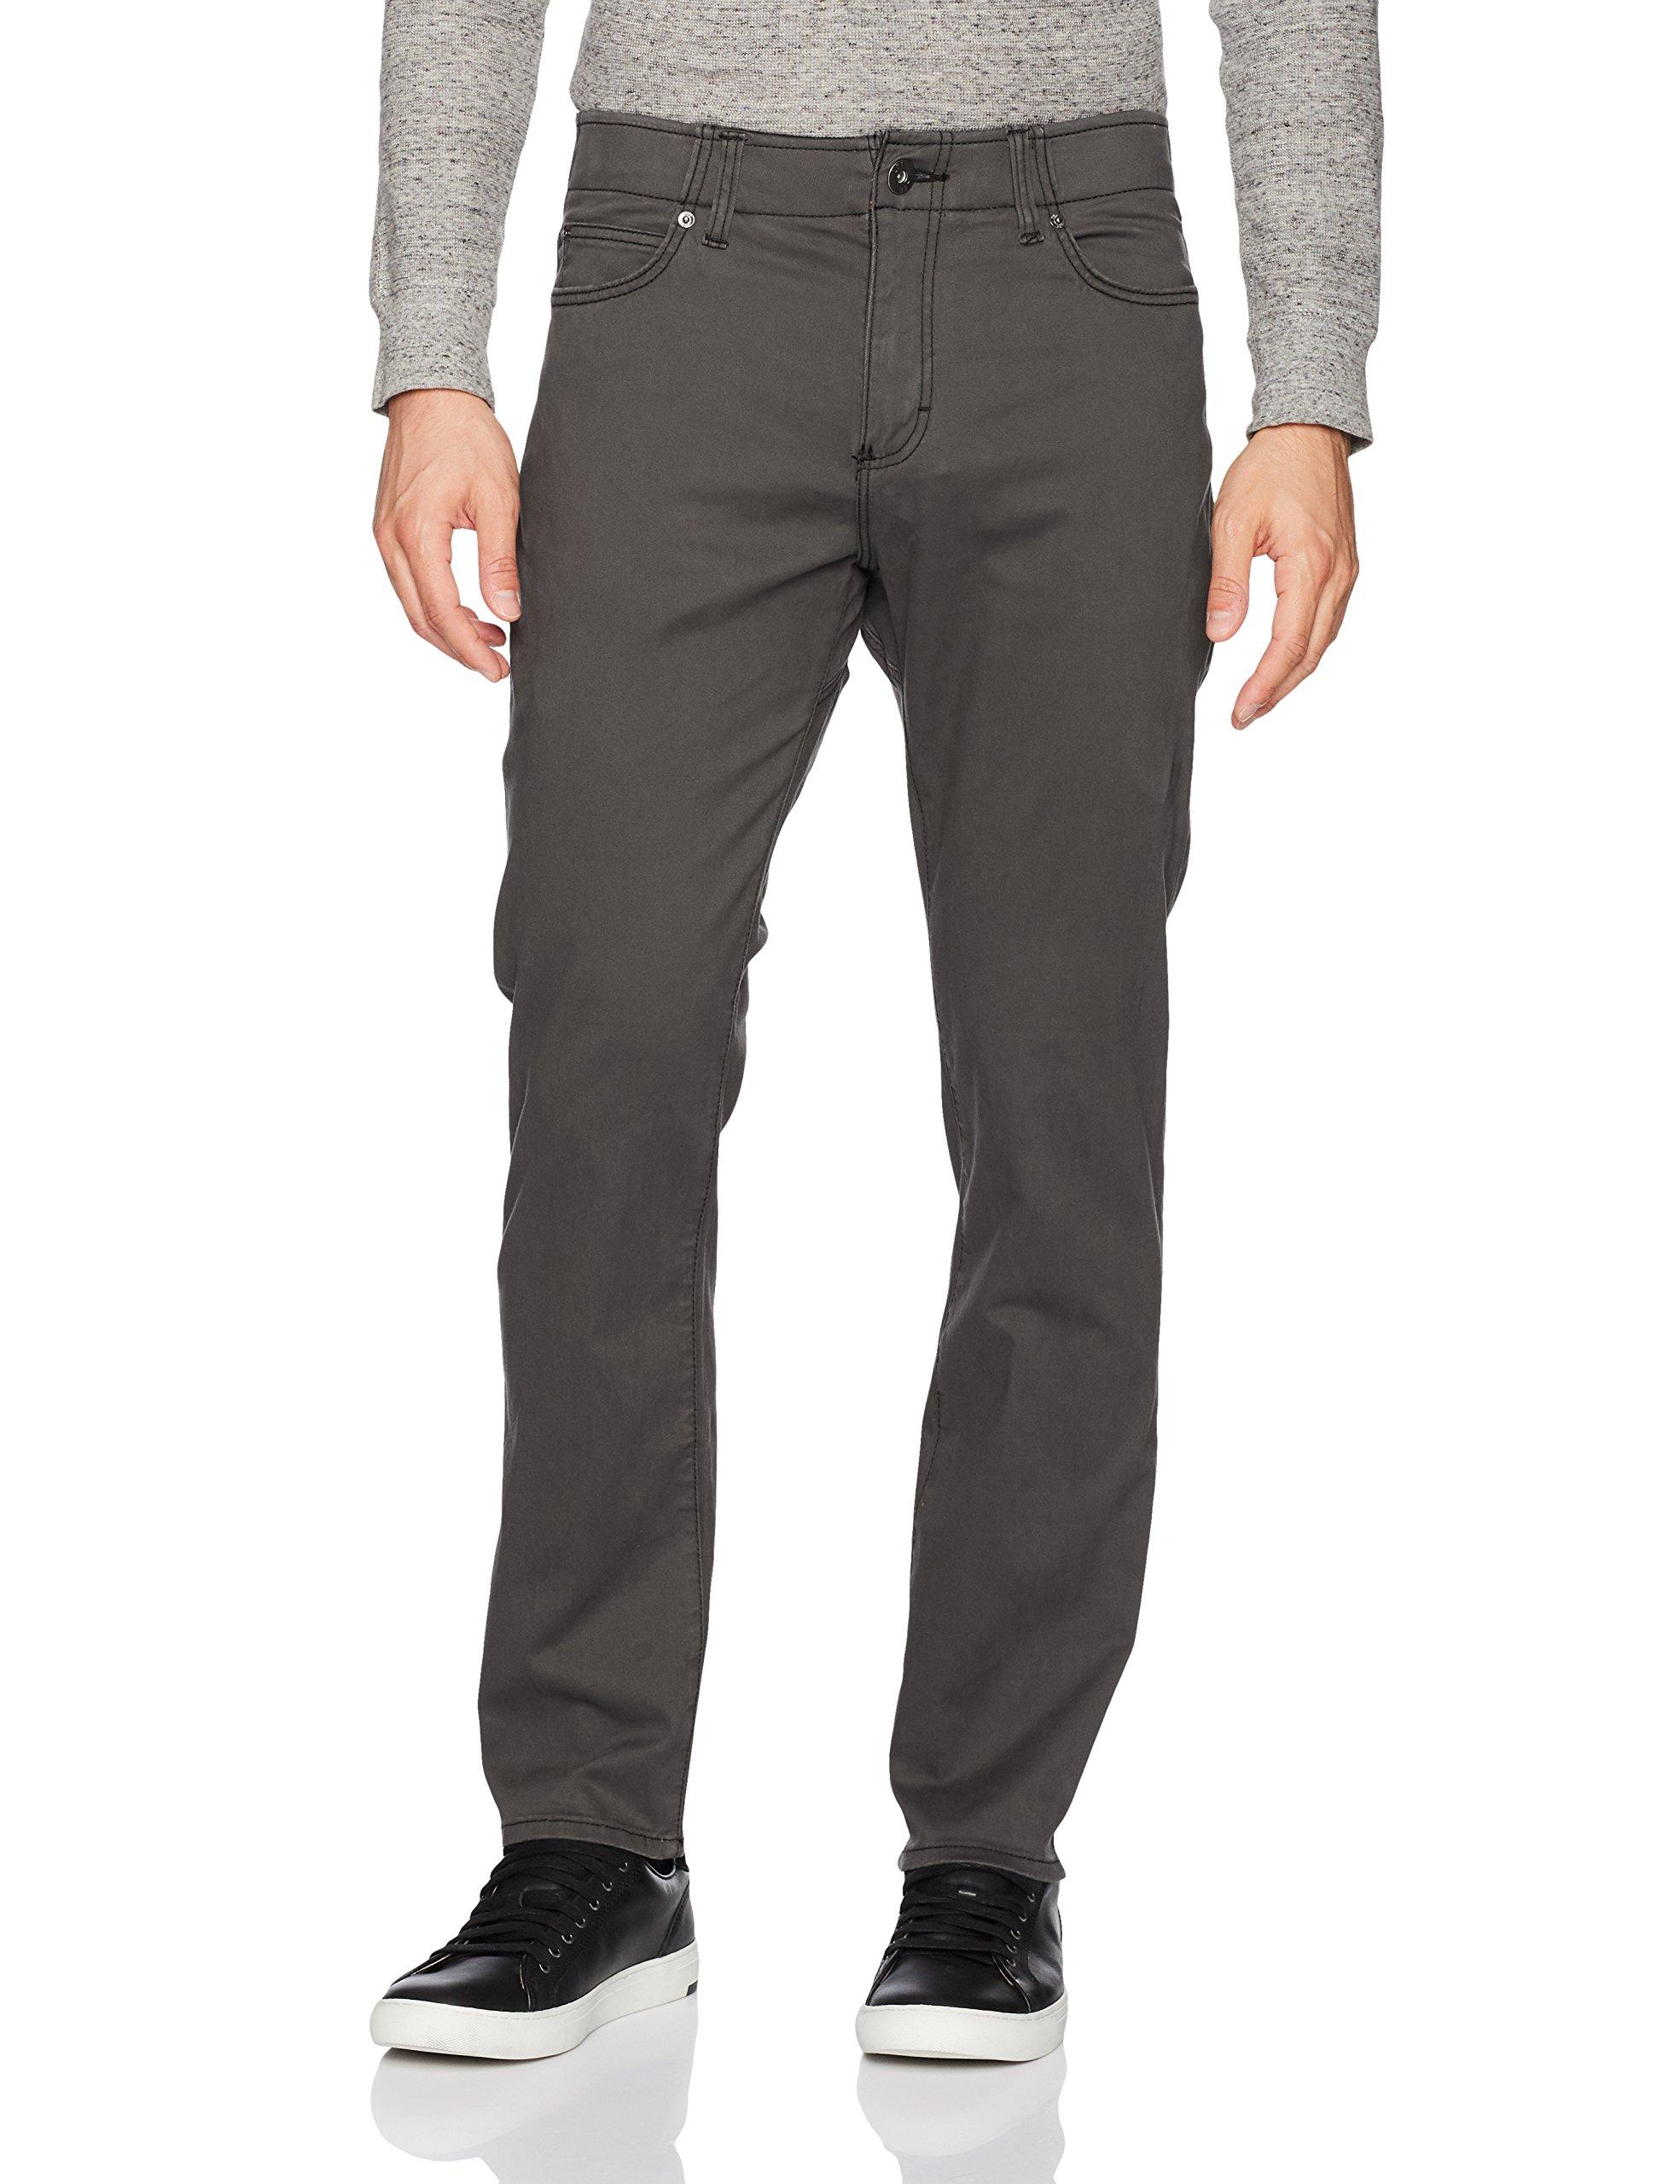 LEE Men's Modern Series Extreme Motion Athletic Jean, Dark Gray, 32W x 30L